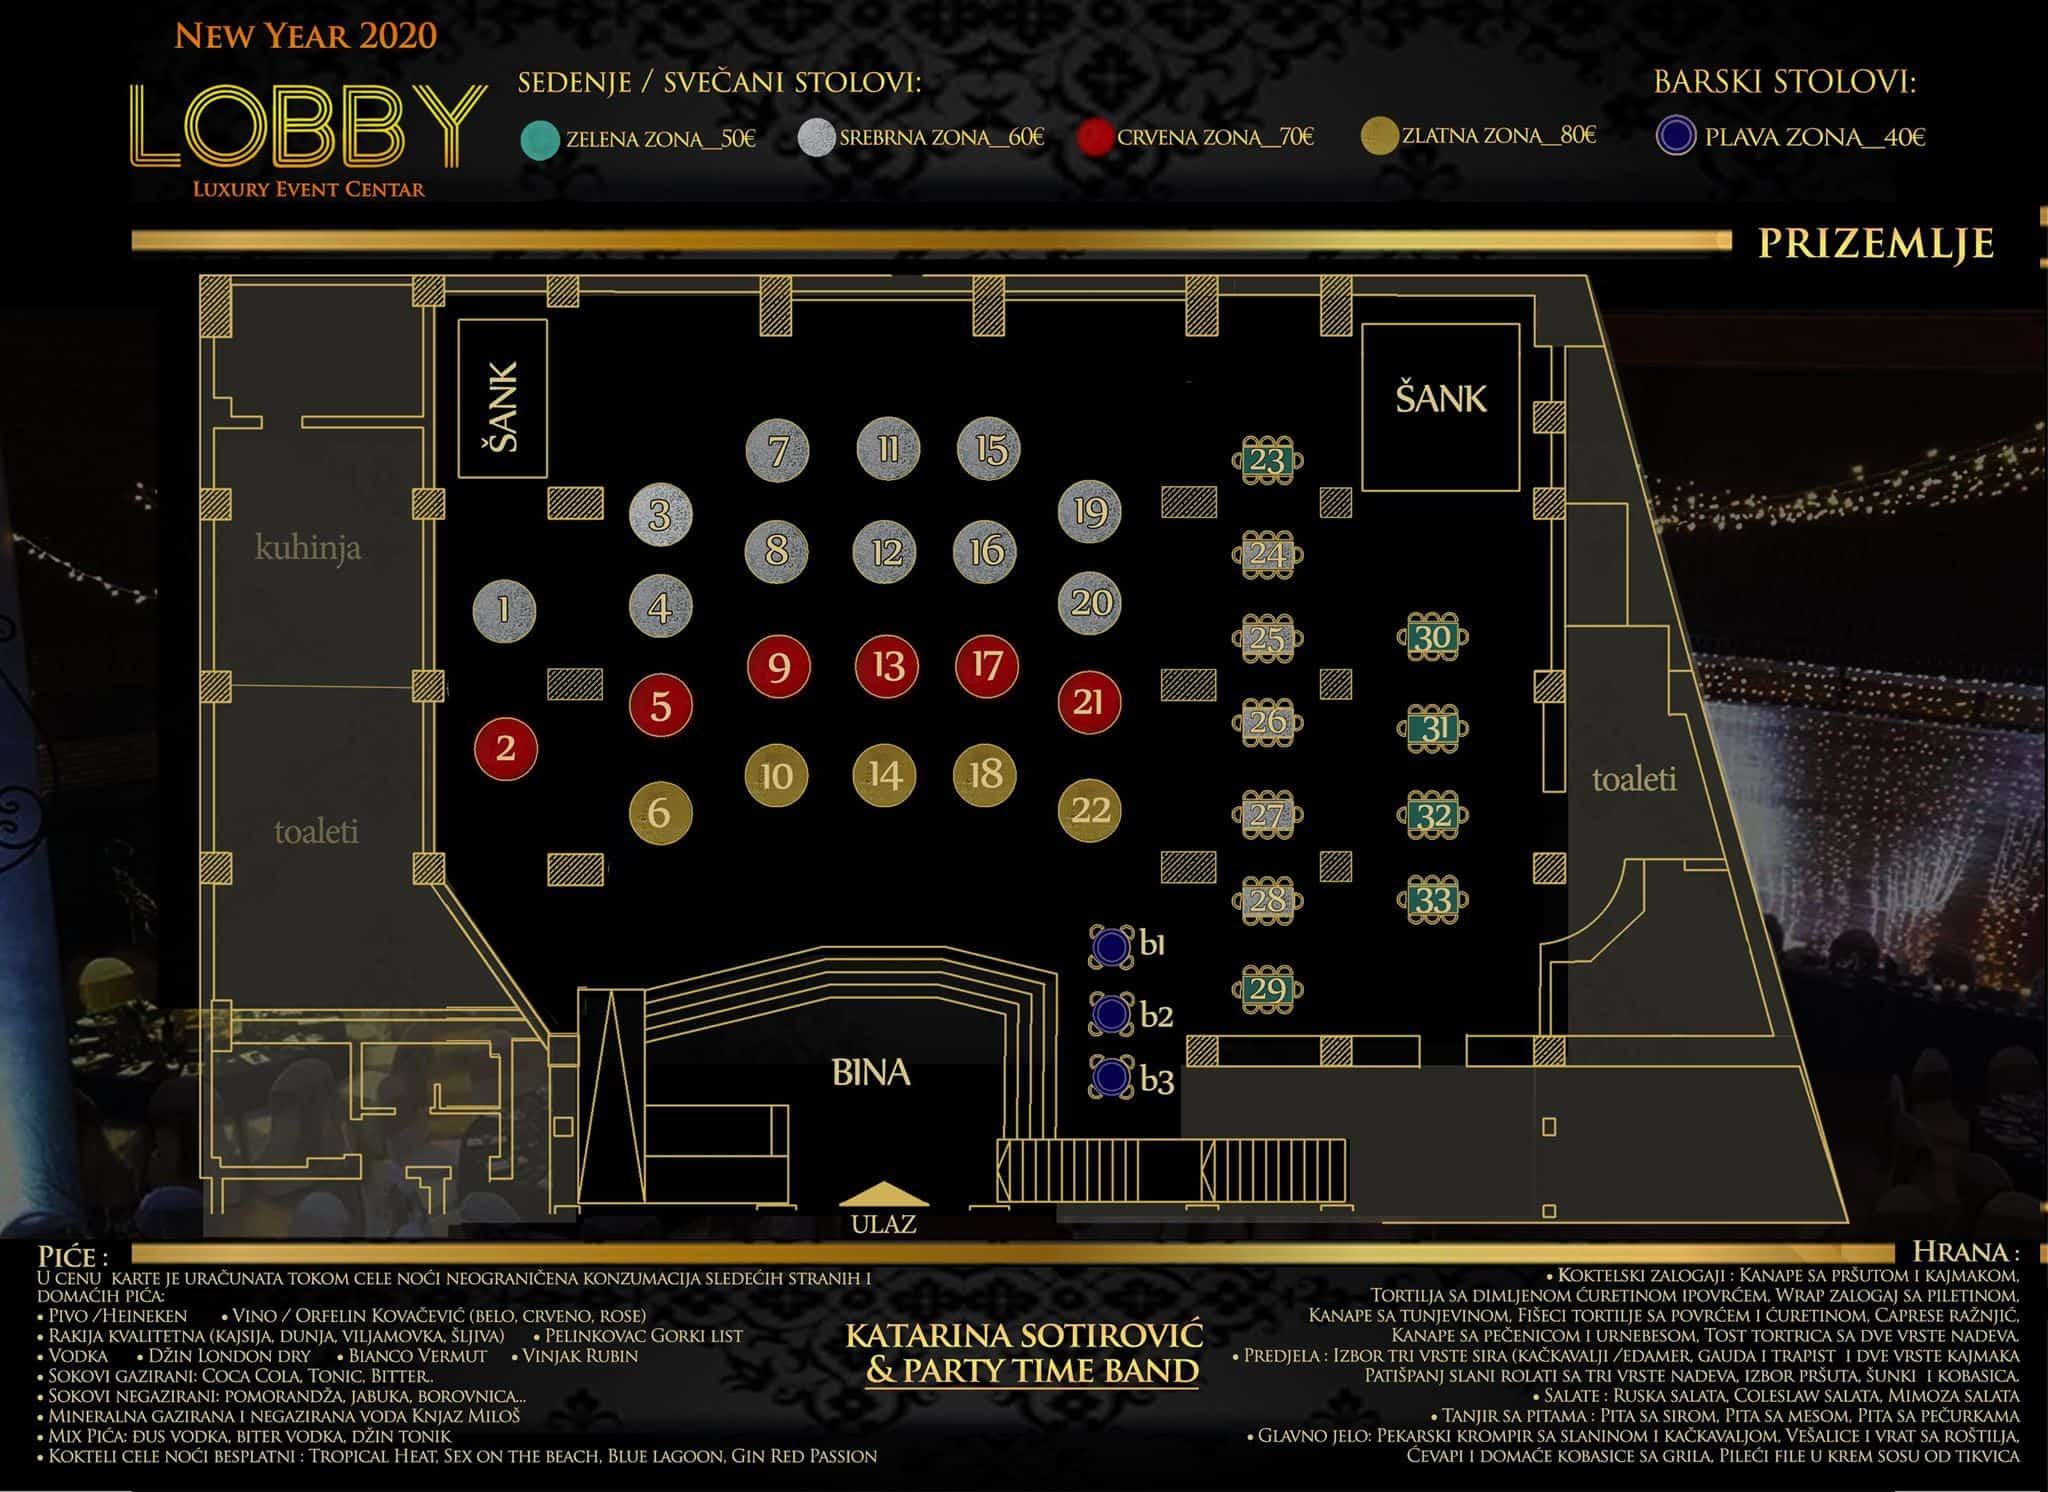 Docek Nove godine Beograd 2020 Lobby Event Center mapa 1